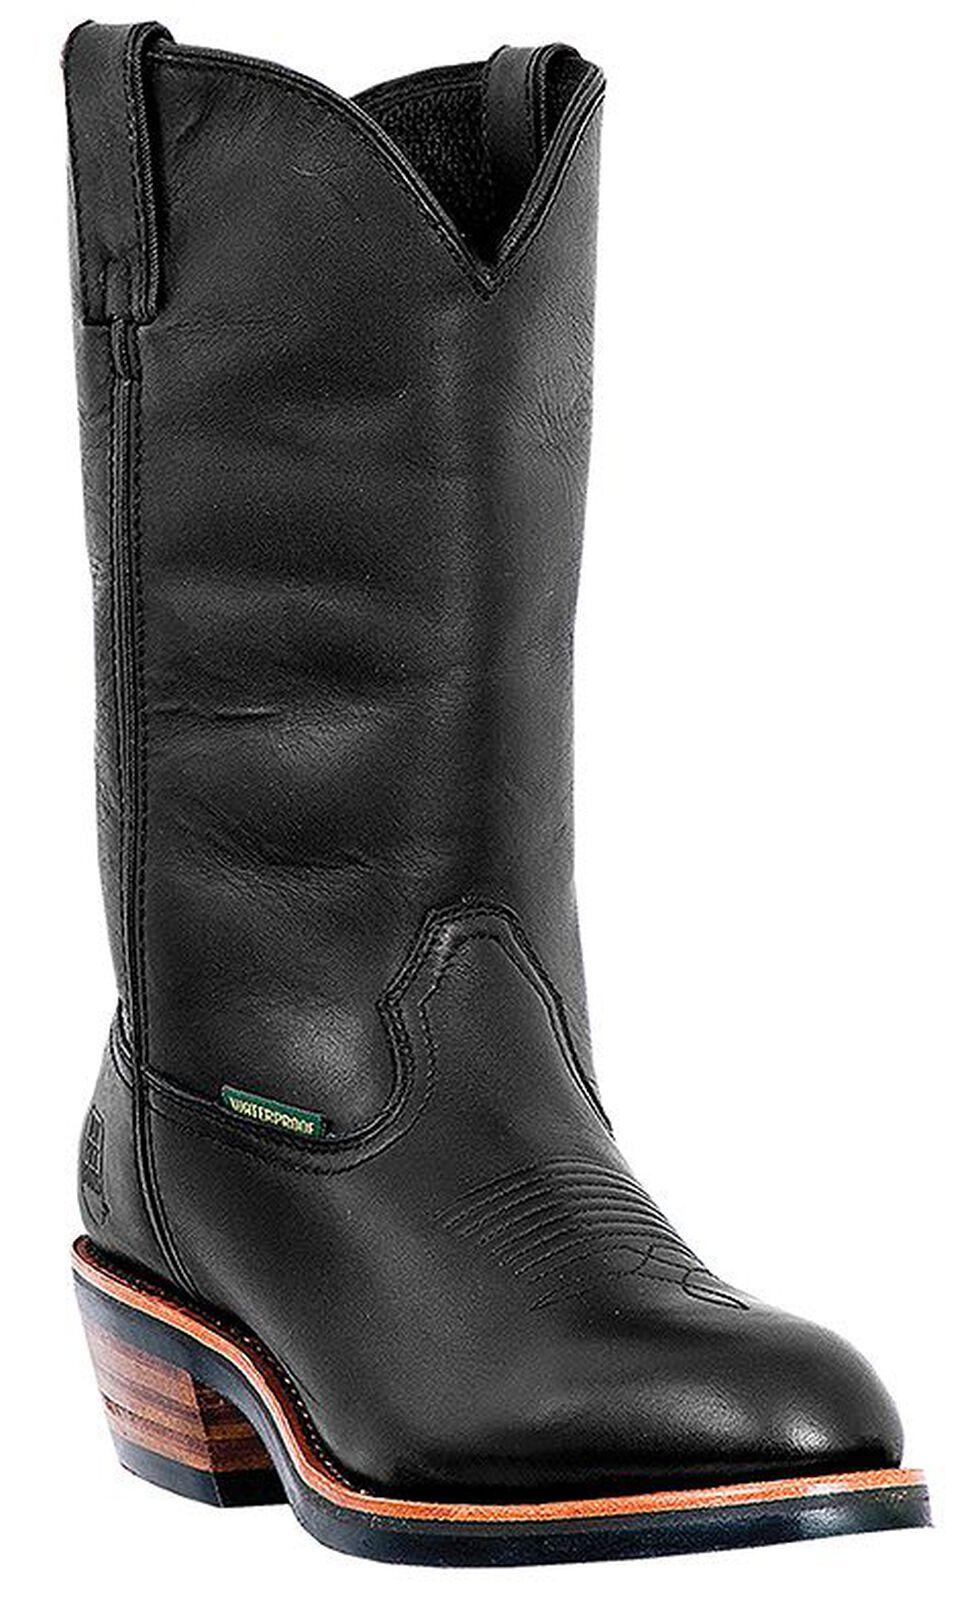 Dan Post Albuquerque Waterproof Pull-On Work Boots - Round Toe, Black, hi-res